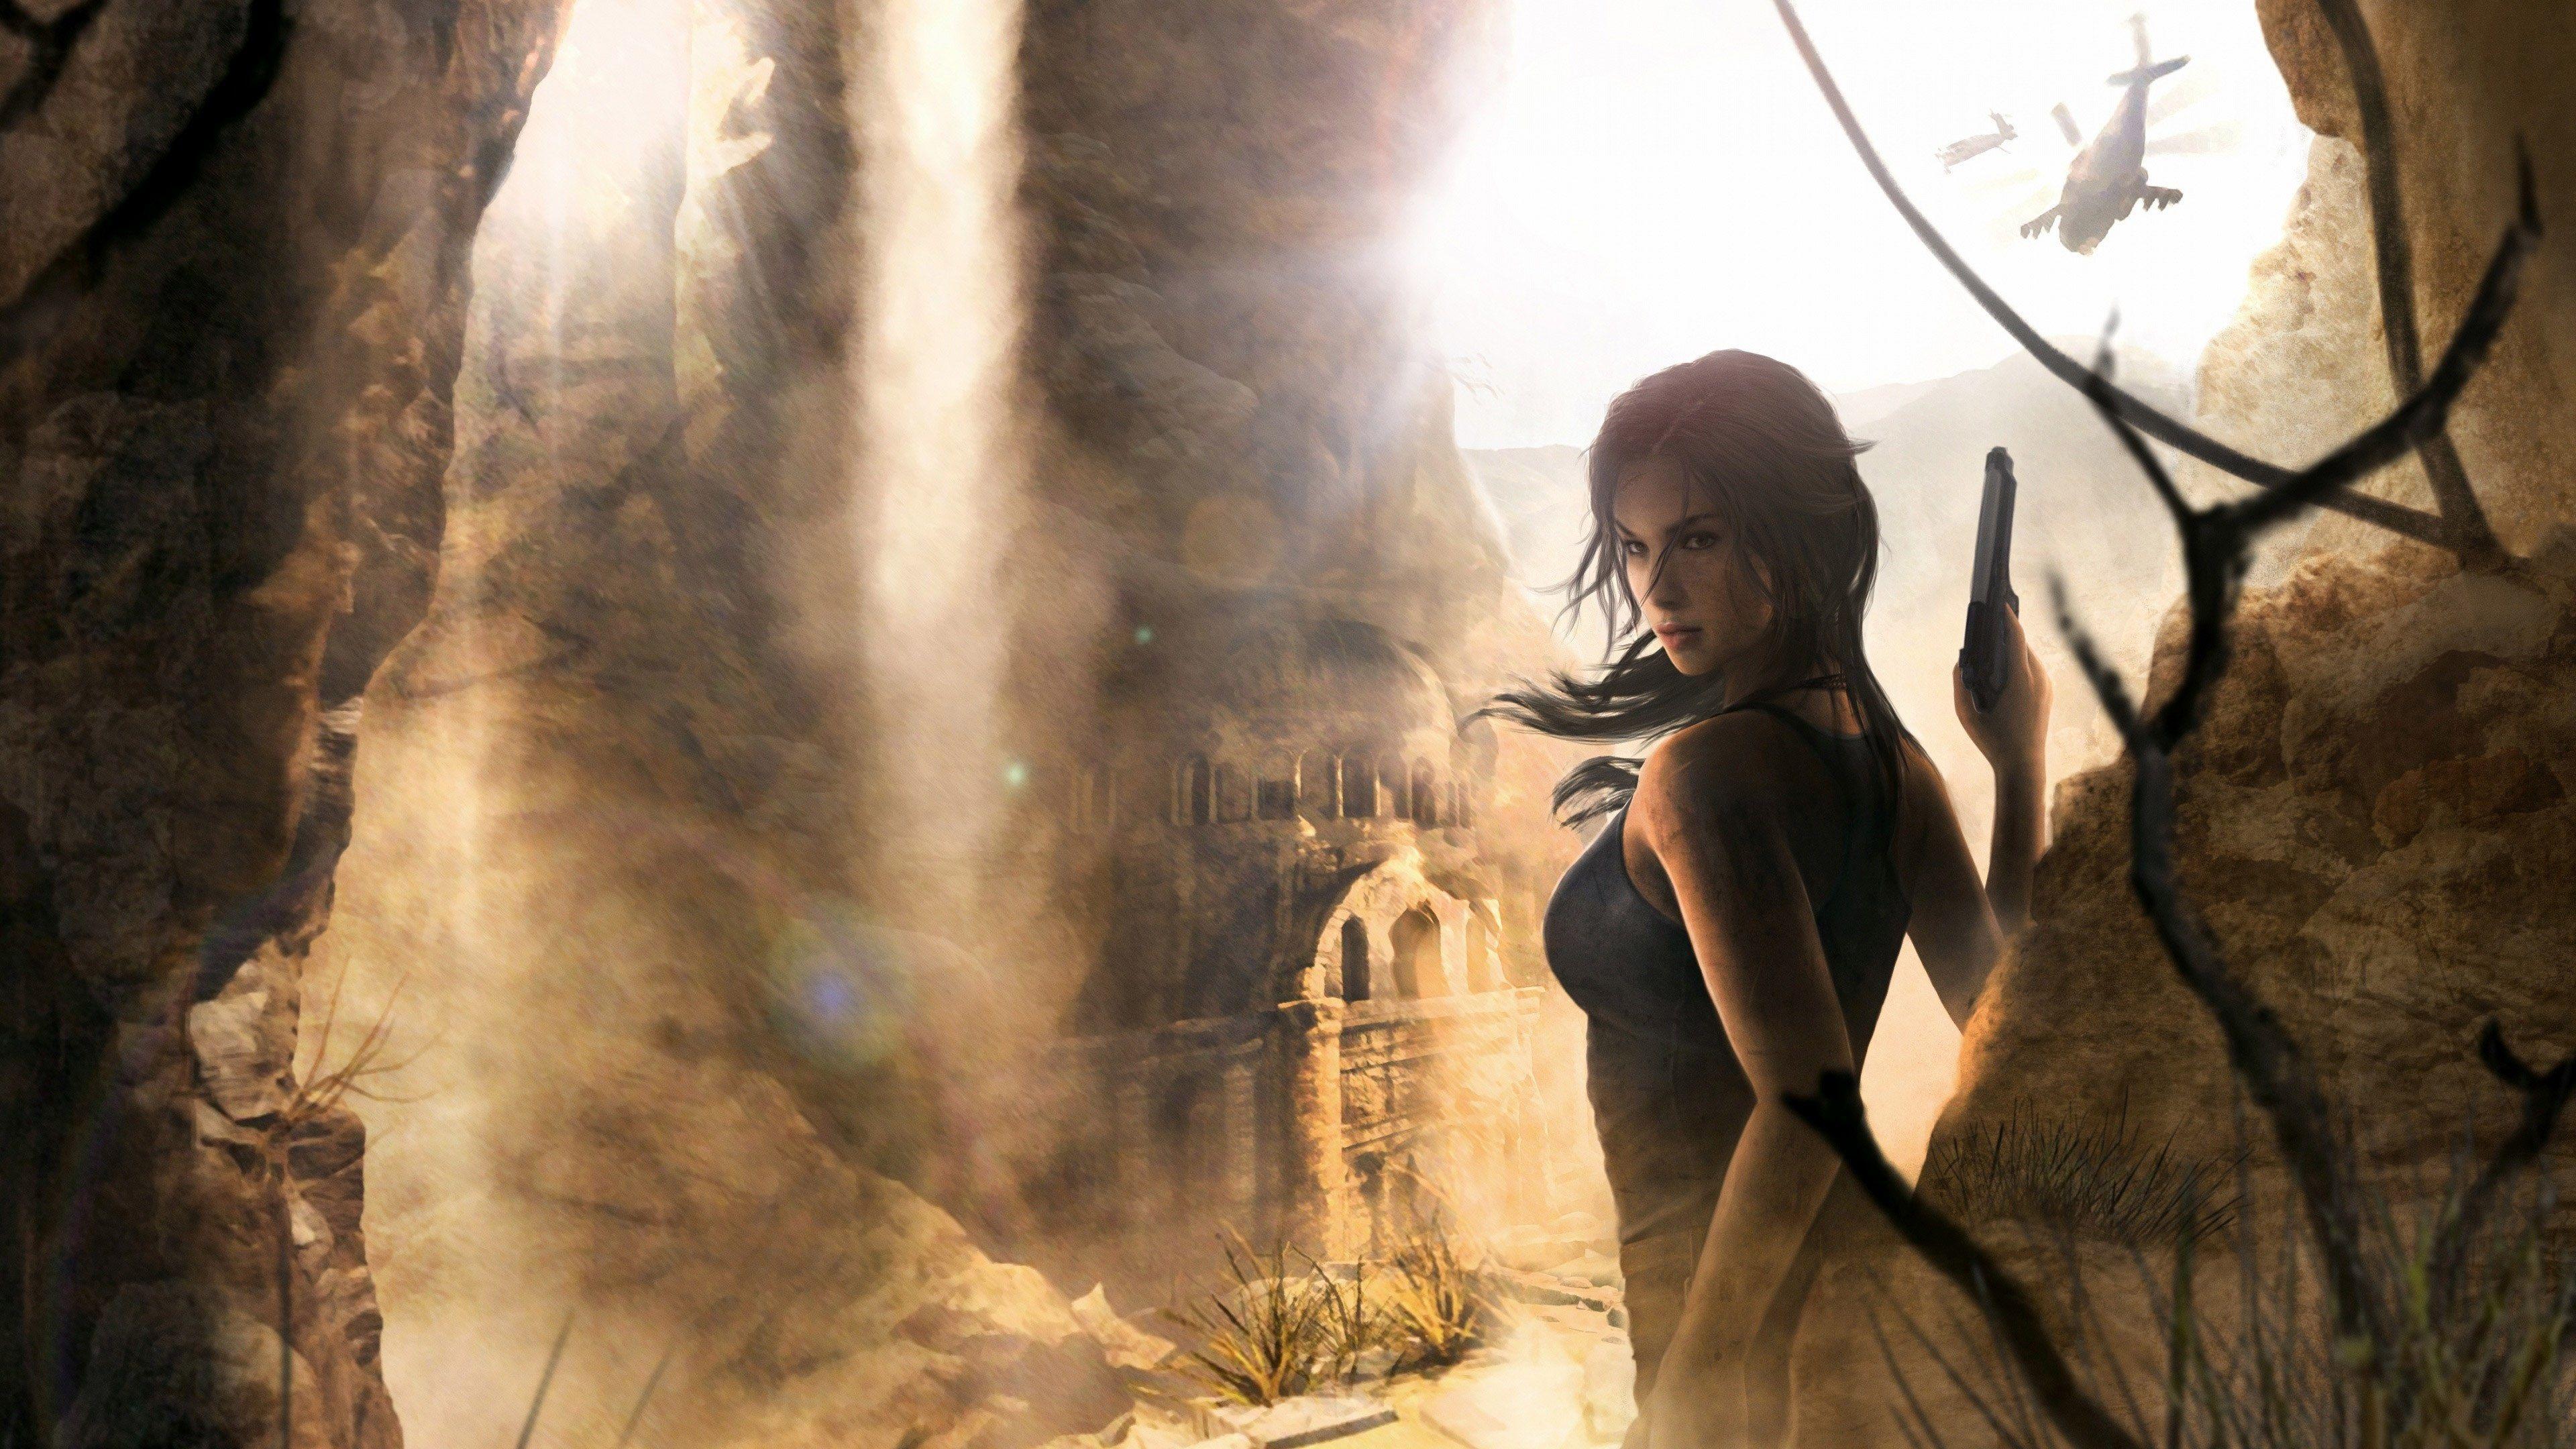 3840x2160 Lara Croft 4k Wallpaper For Hd Desktop Tomb Raider Wallpaper Tomb Raider Rise Of The Tomb